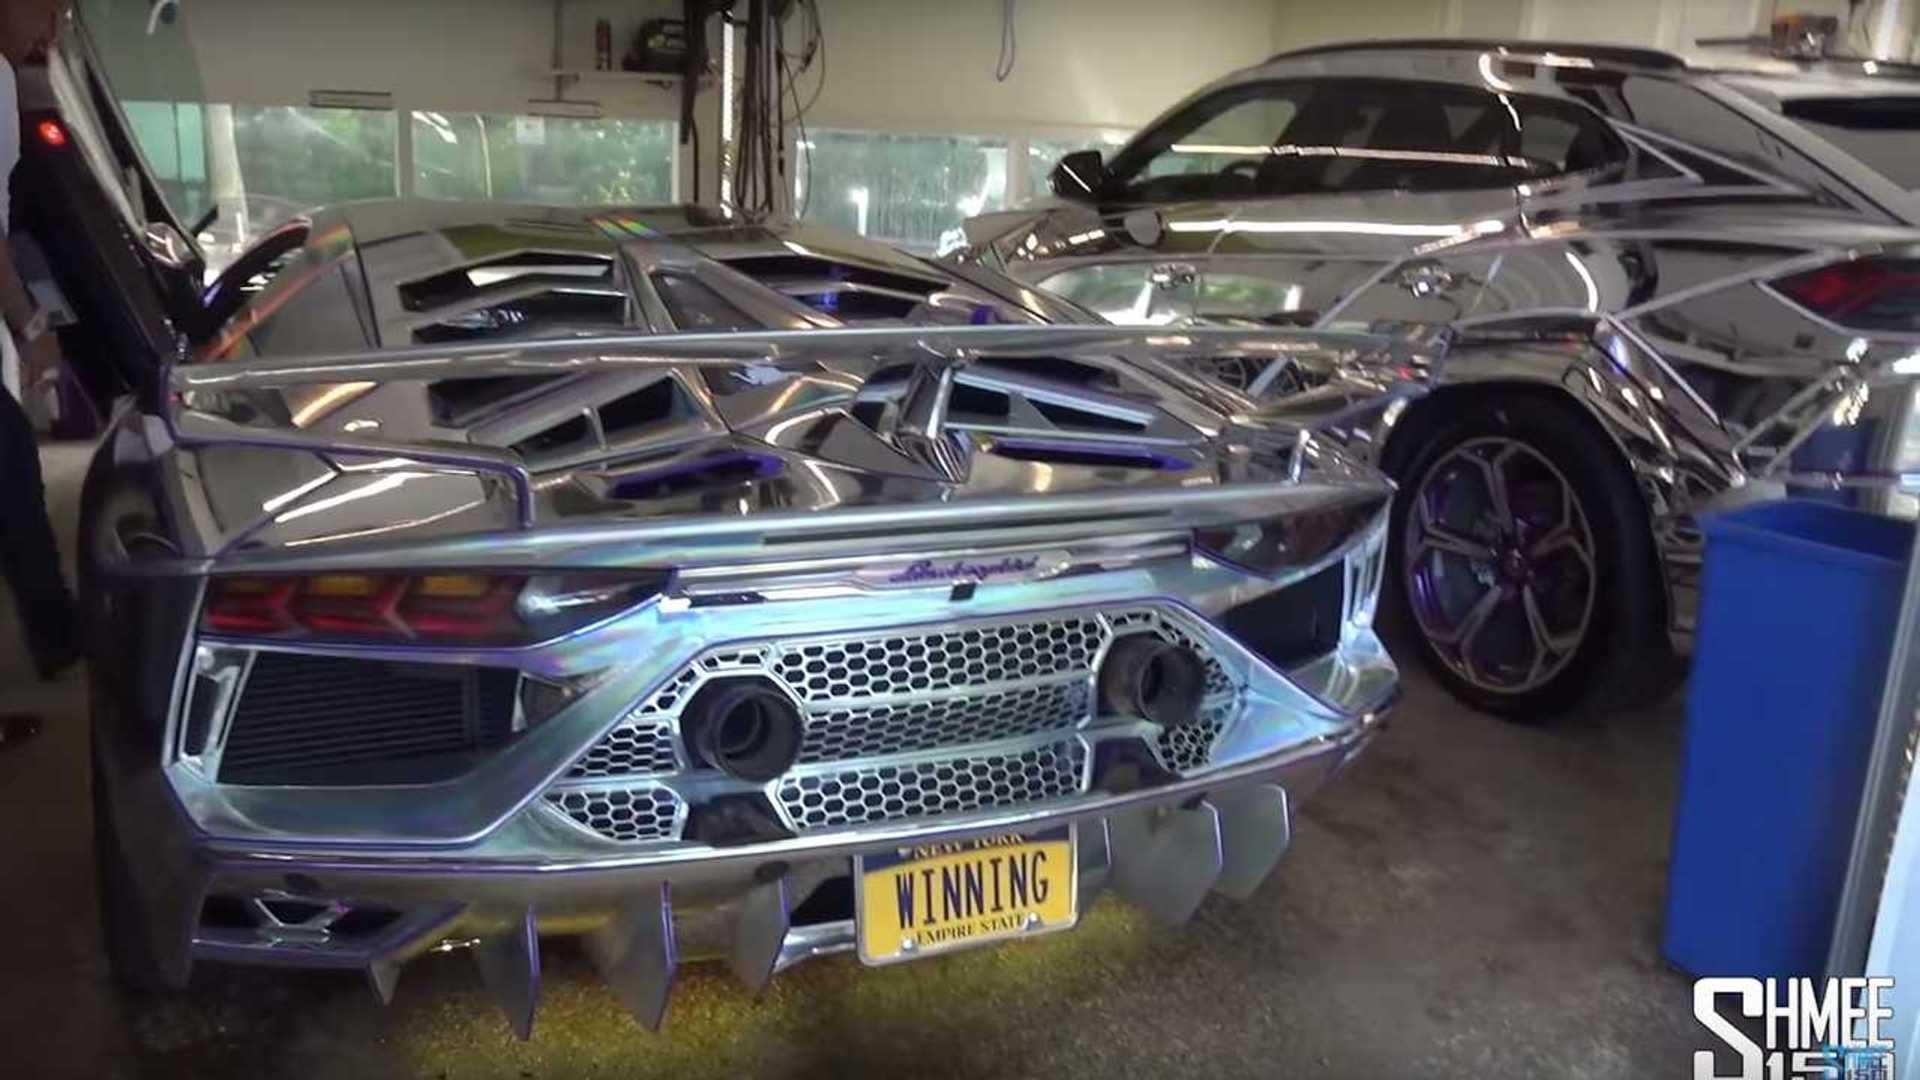 Chrome Lamborghini Urus, Aventador SVJ Make For A Flashy Duo